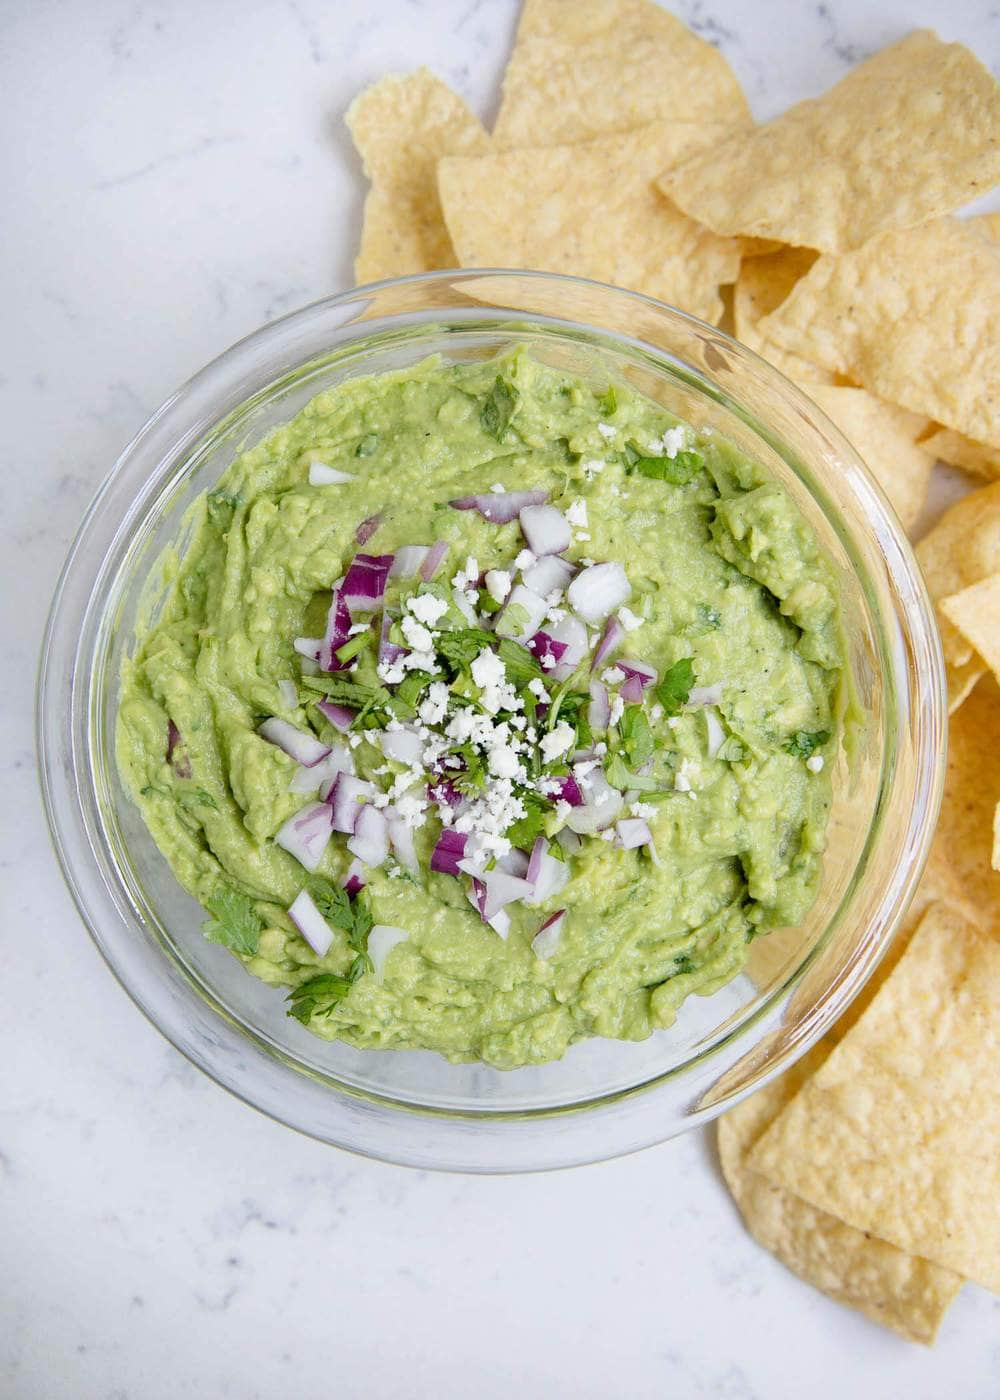 Easy guacamole recipe - I Heart Nap Time